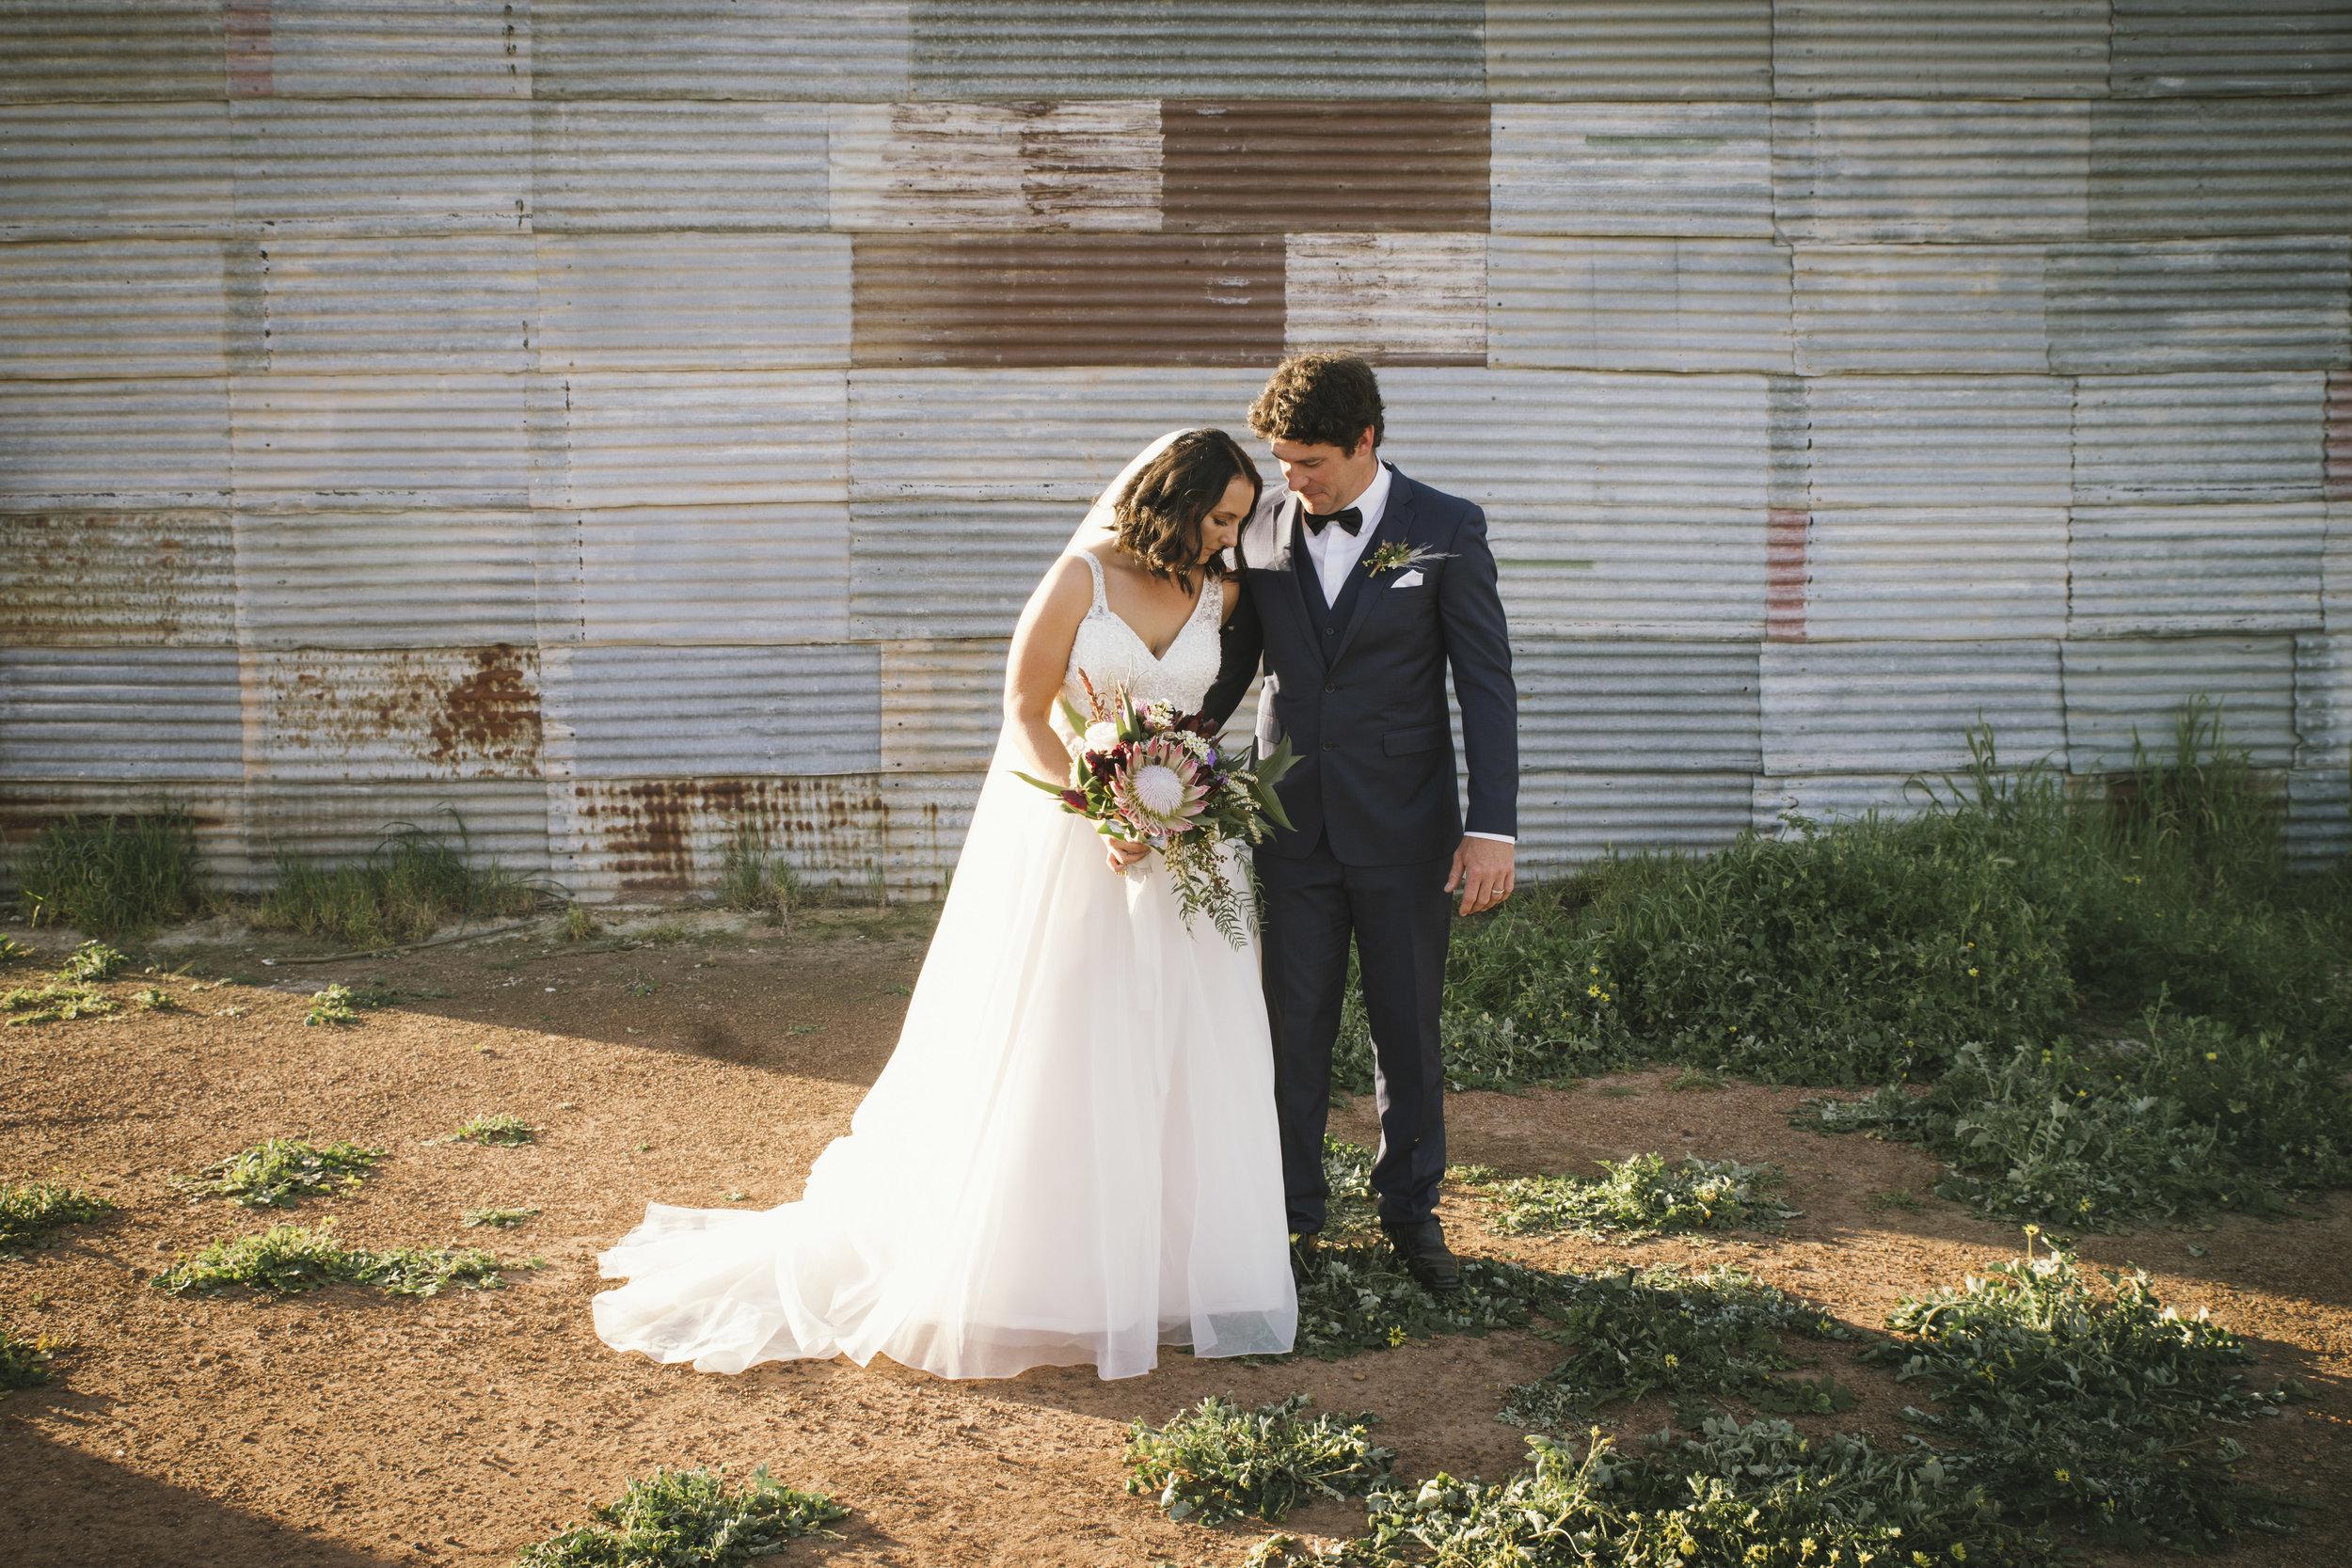 Angie Roe Photography Wheatbelt Avon Valley Farm Wedding (46).jpg